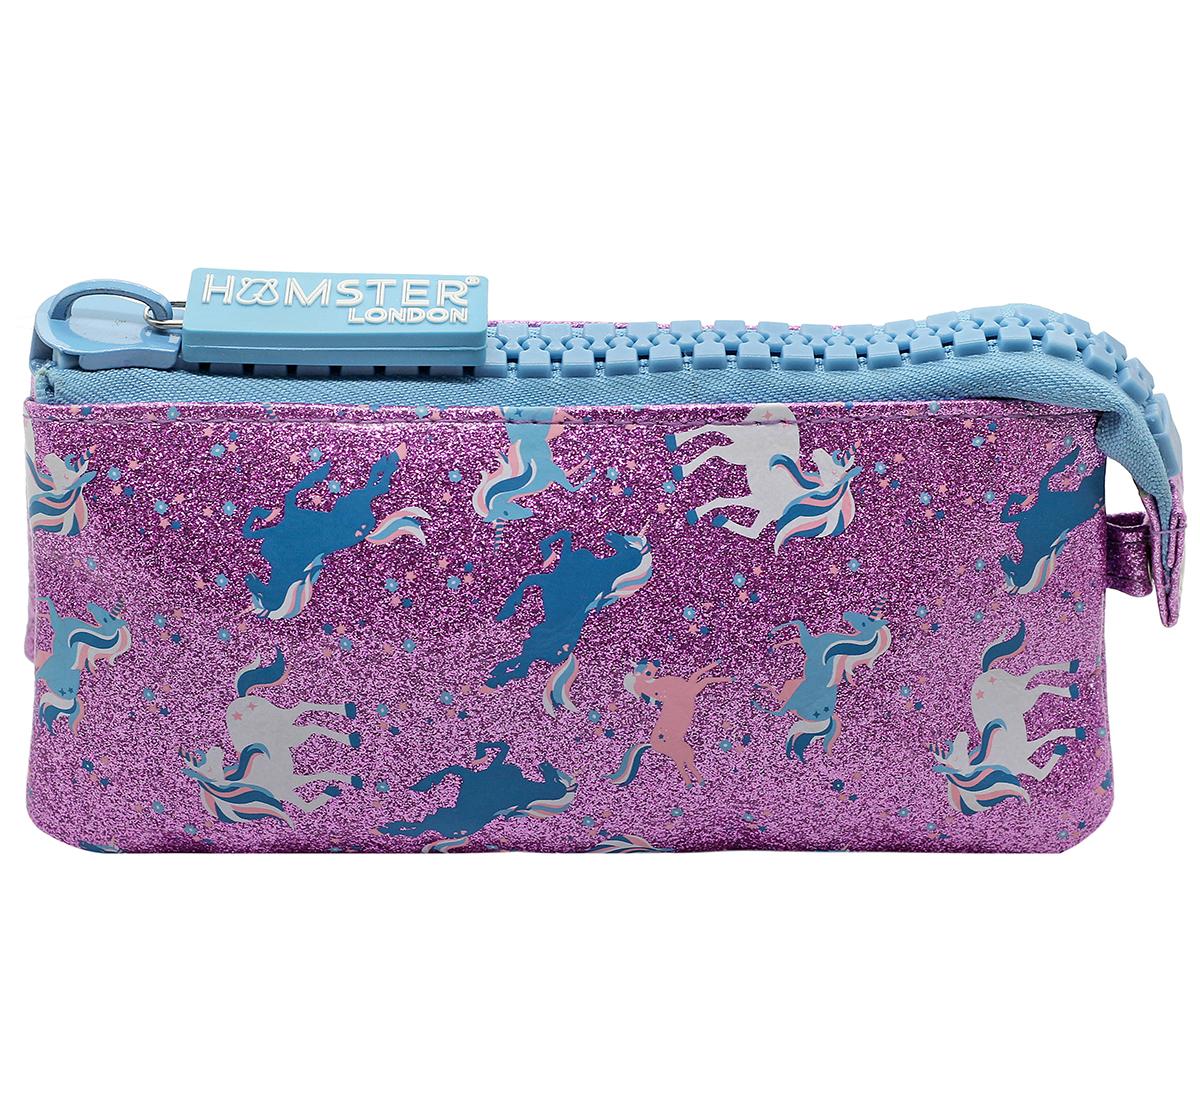 Hamster London | Hamster London Unicorn Big Zipper Pouch for Girls age 3Y+ (Purple)